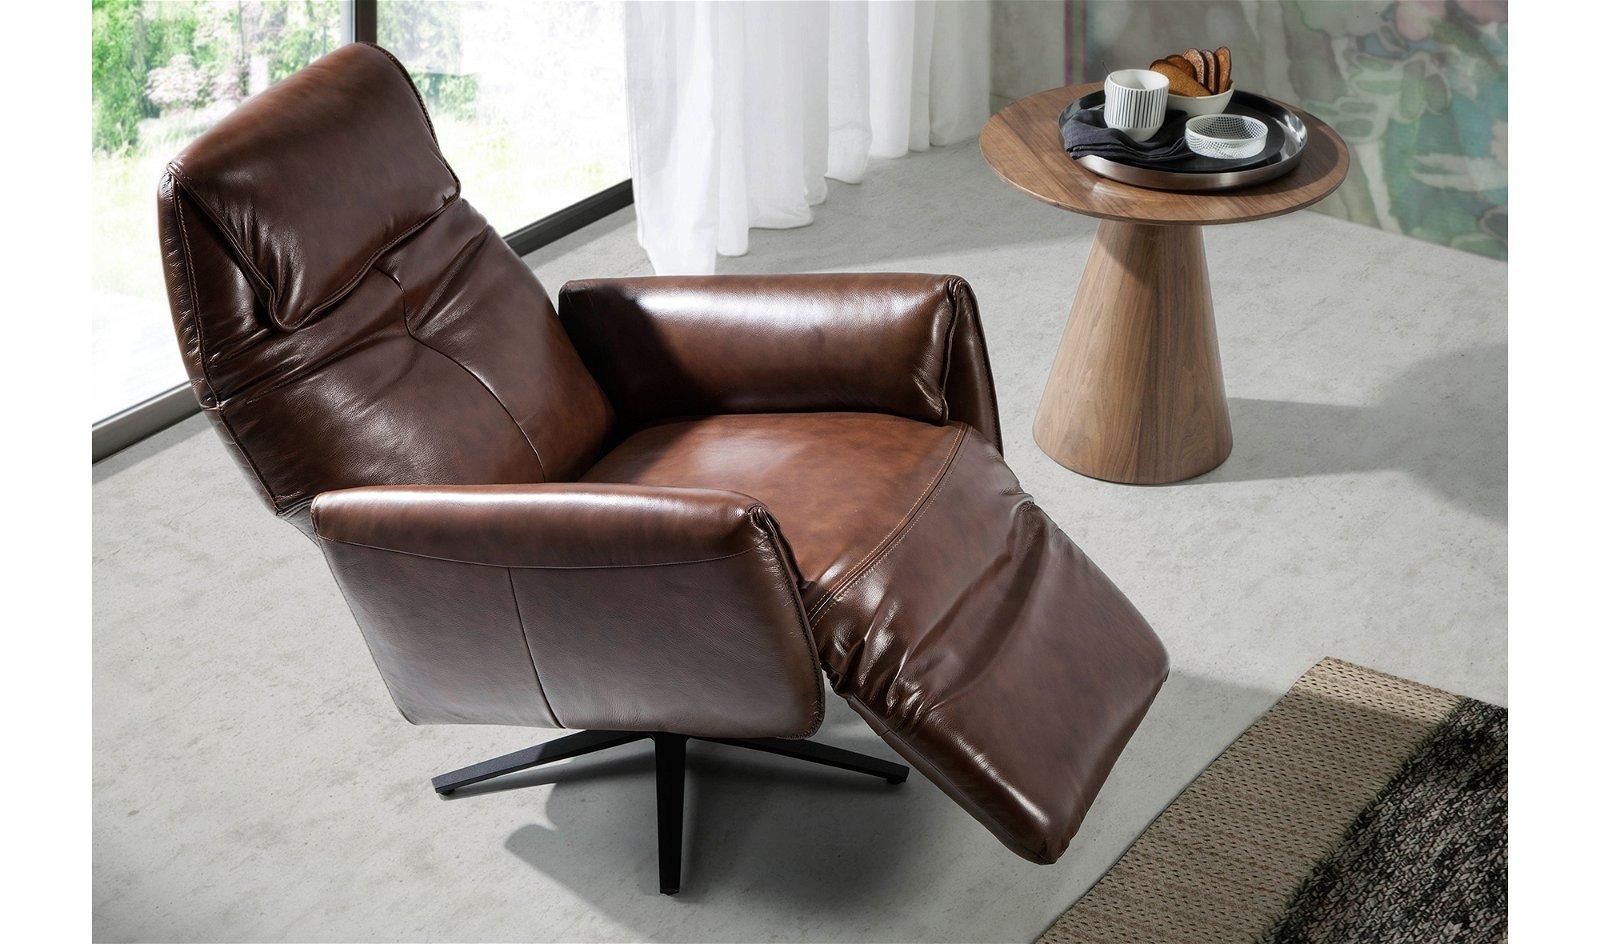 Butaca Relax giratoria moderna piel y acero Gorreto